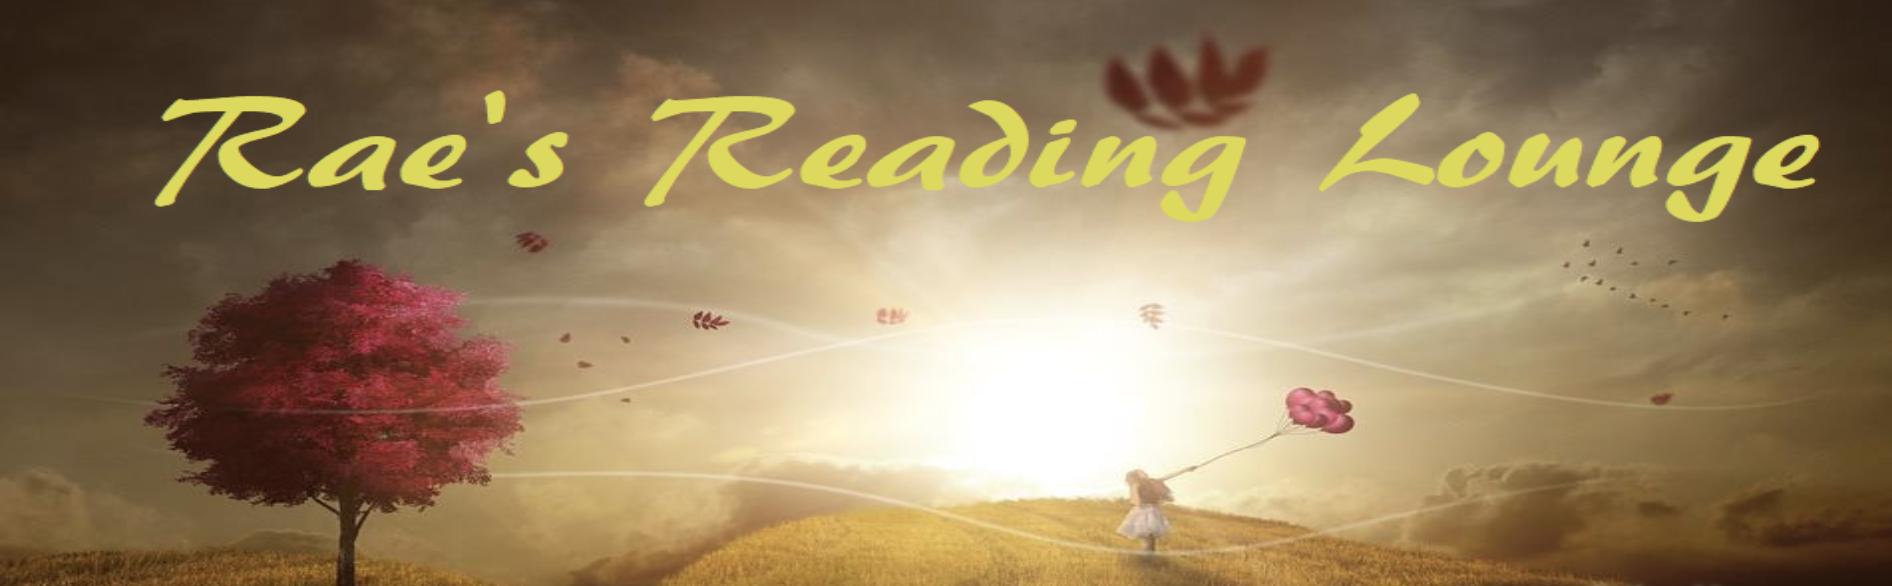 Rae's Reading Lounge